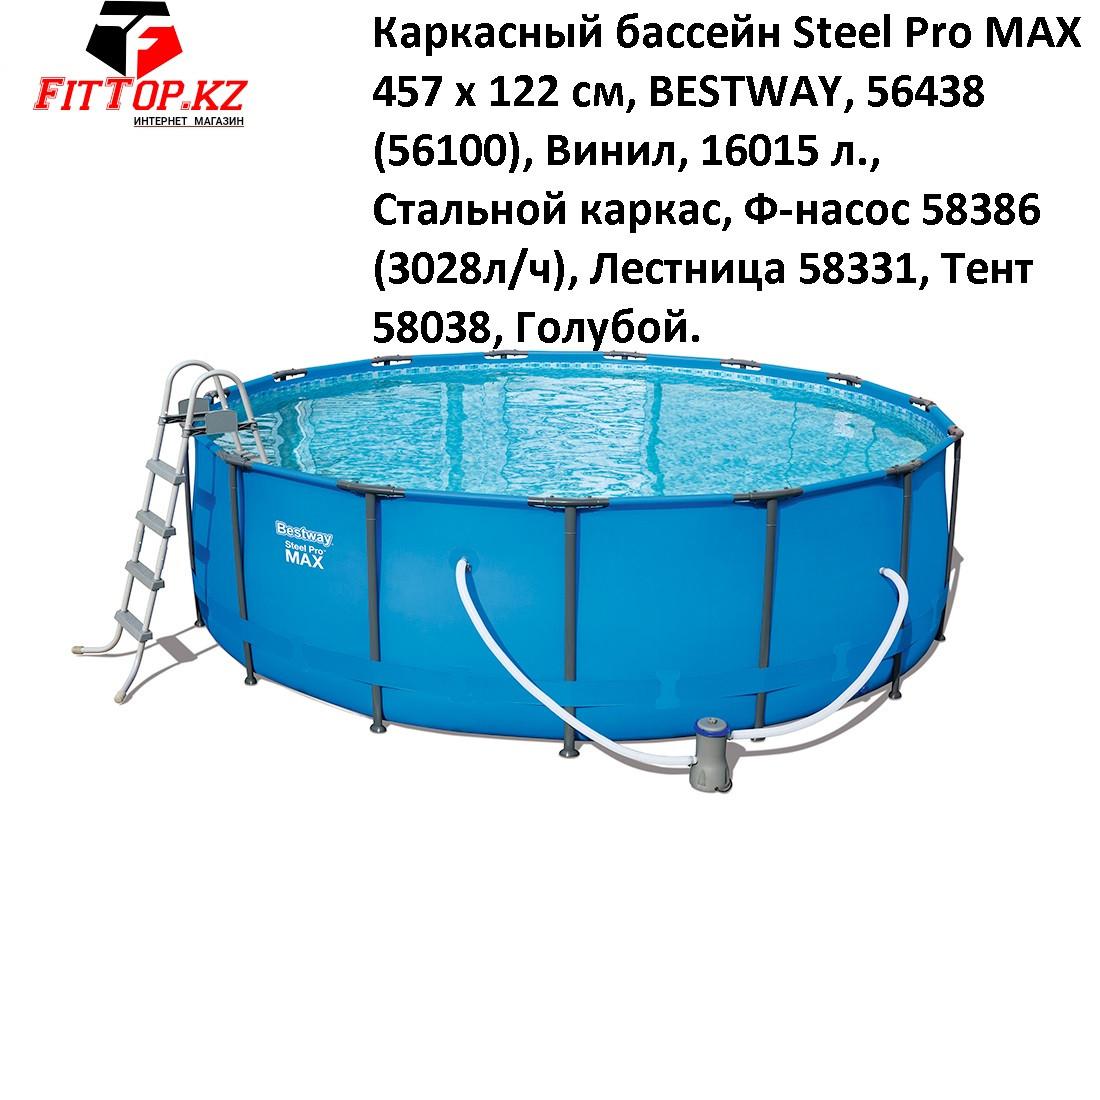 Каркасный бассейн Steel Pro MAX 457 х 122 см, BESTWAY, 56438 (56100), Винил, 16015 л